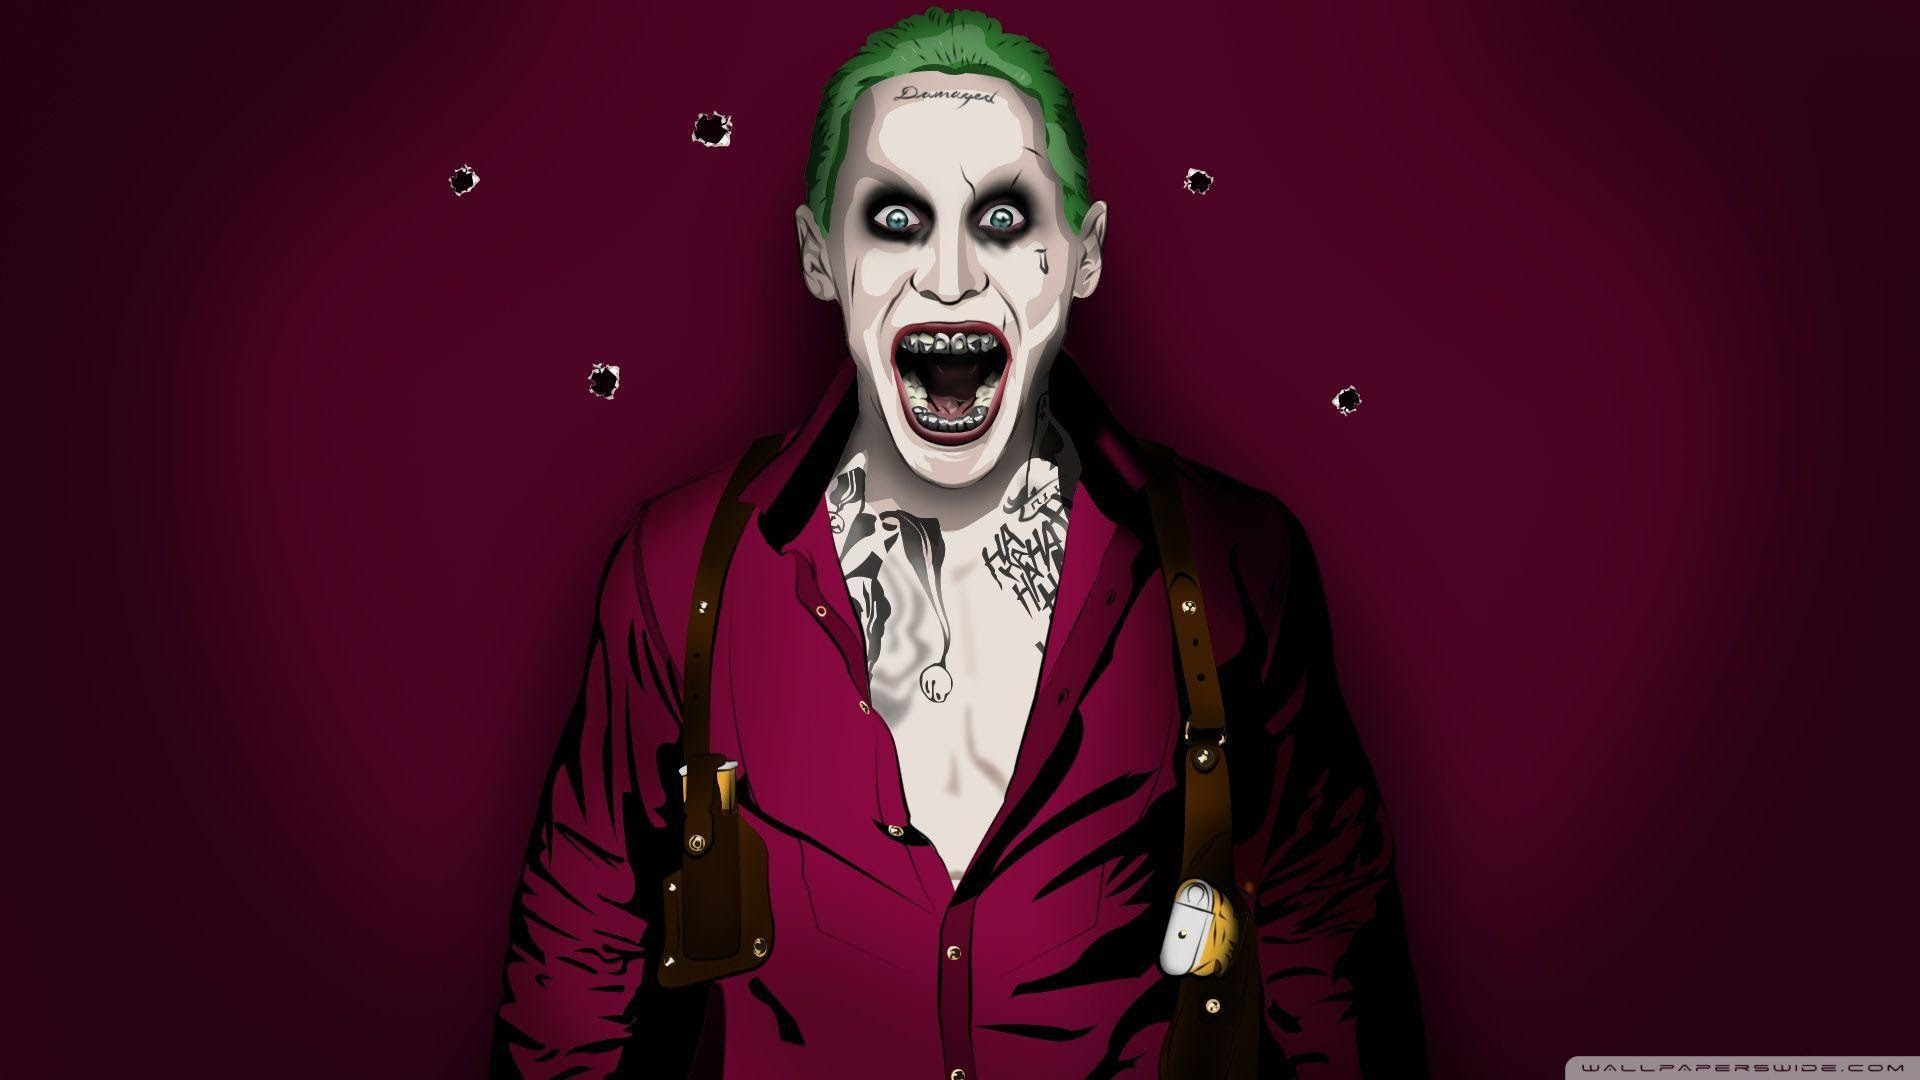 Cool Ultra Hd Joker Hd Wallpaper 4k Download Images